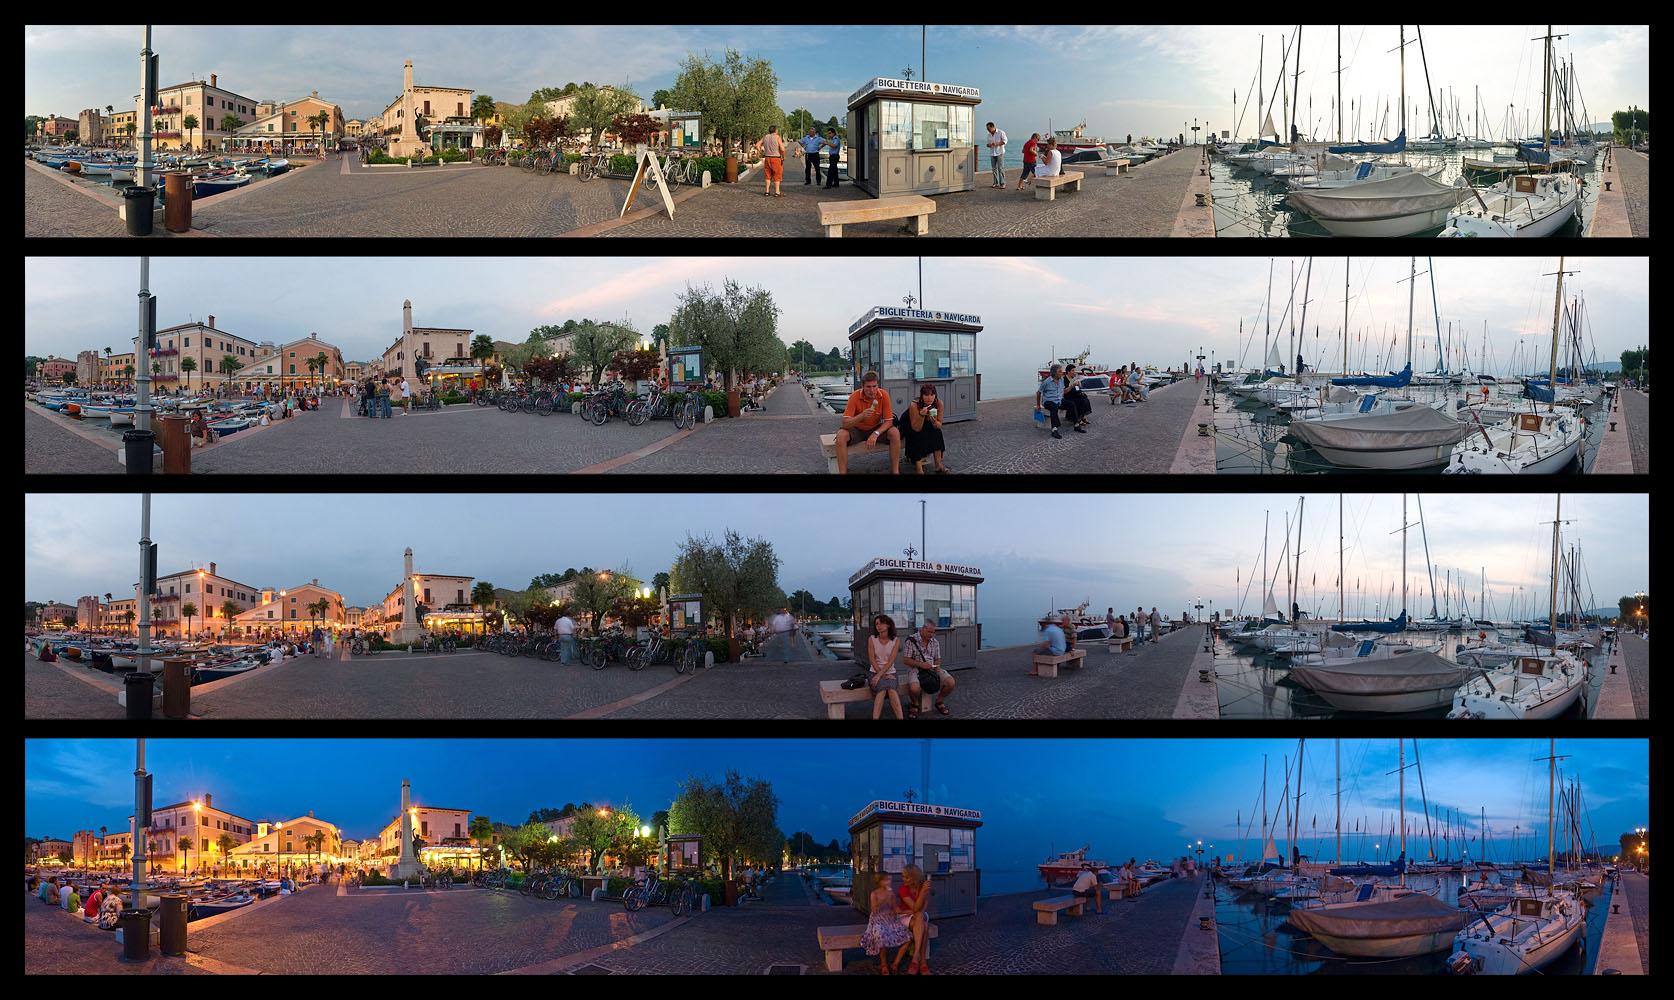 Bardolino harbor - into the night